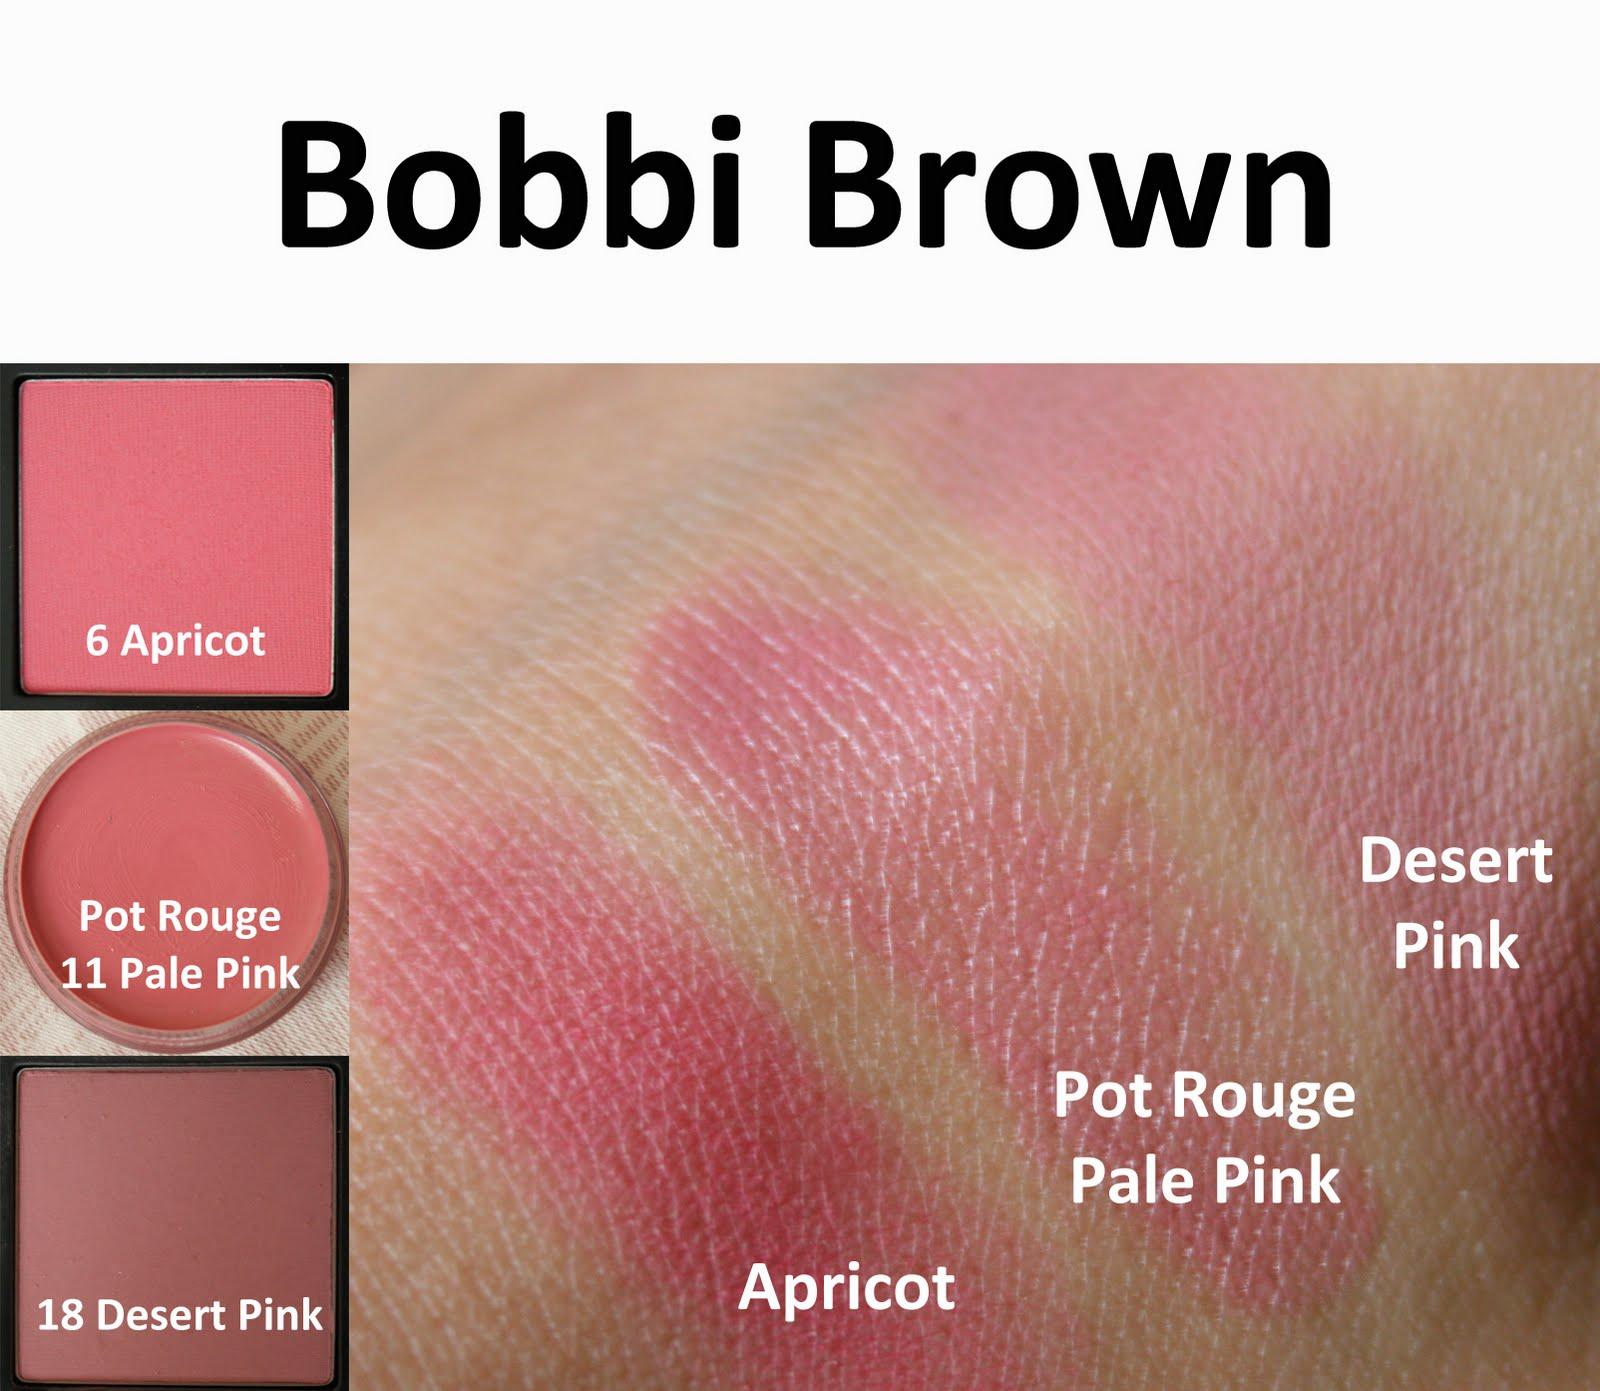 A Cup Of Beauty My Blush Collection 1 Nars Illamasqua Bobbi Brown Chanel Amp Estee Lauder